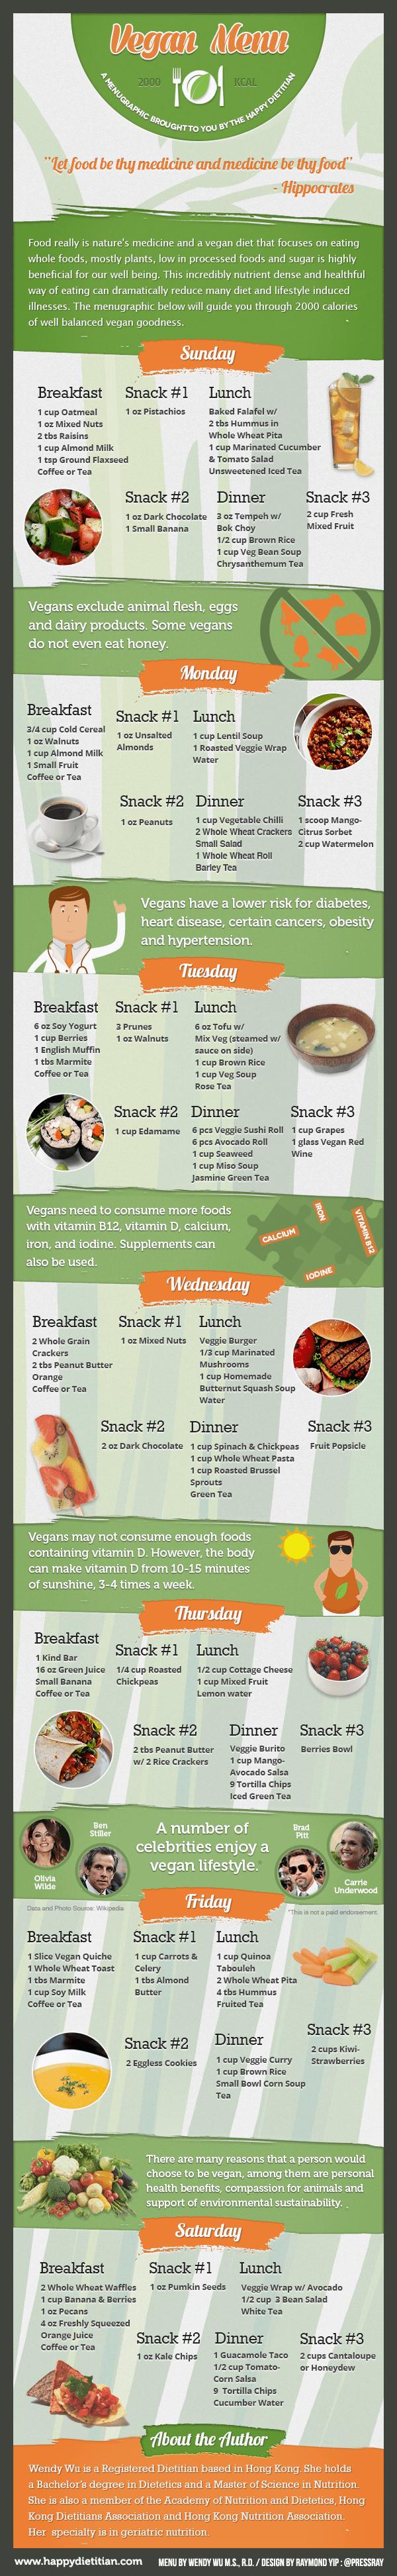 2000 calorie vegan diet plan